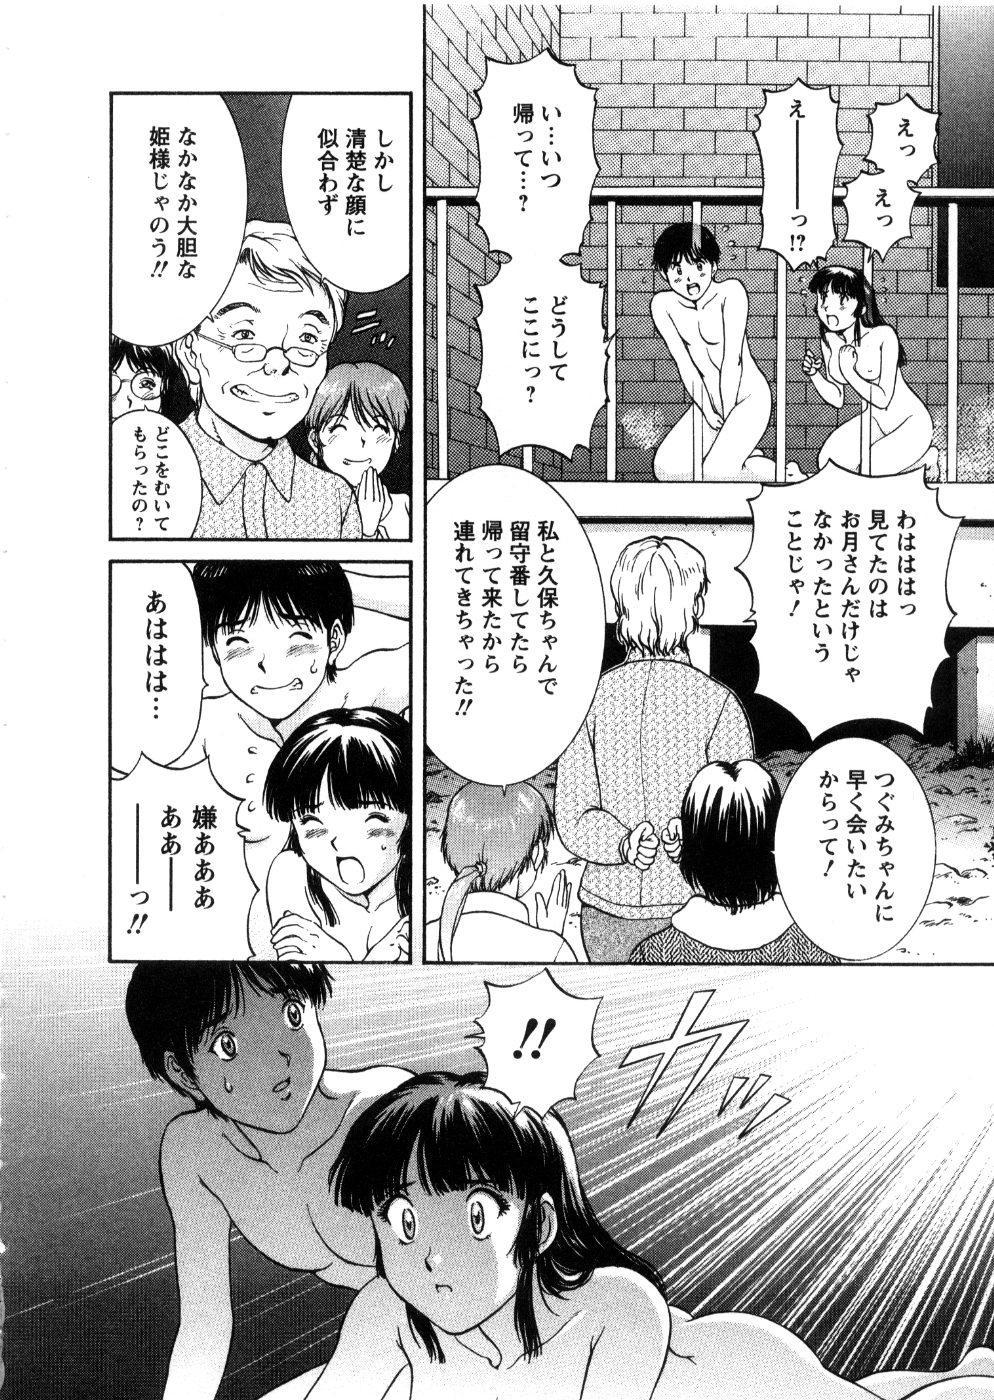 Oneechan-tachi ga Yatte Kuru 03 147